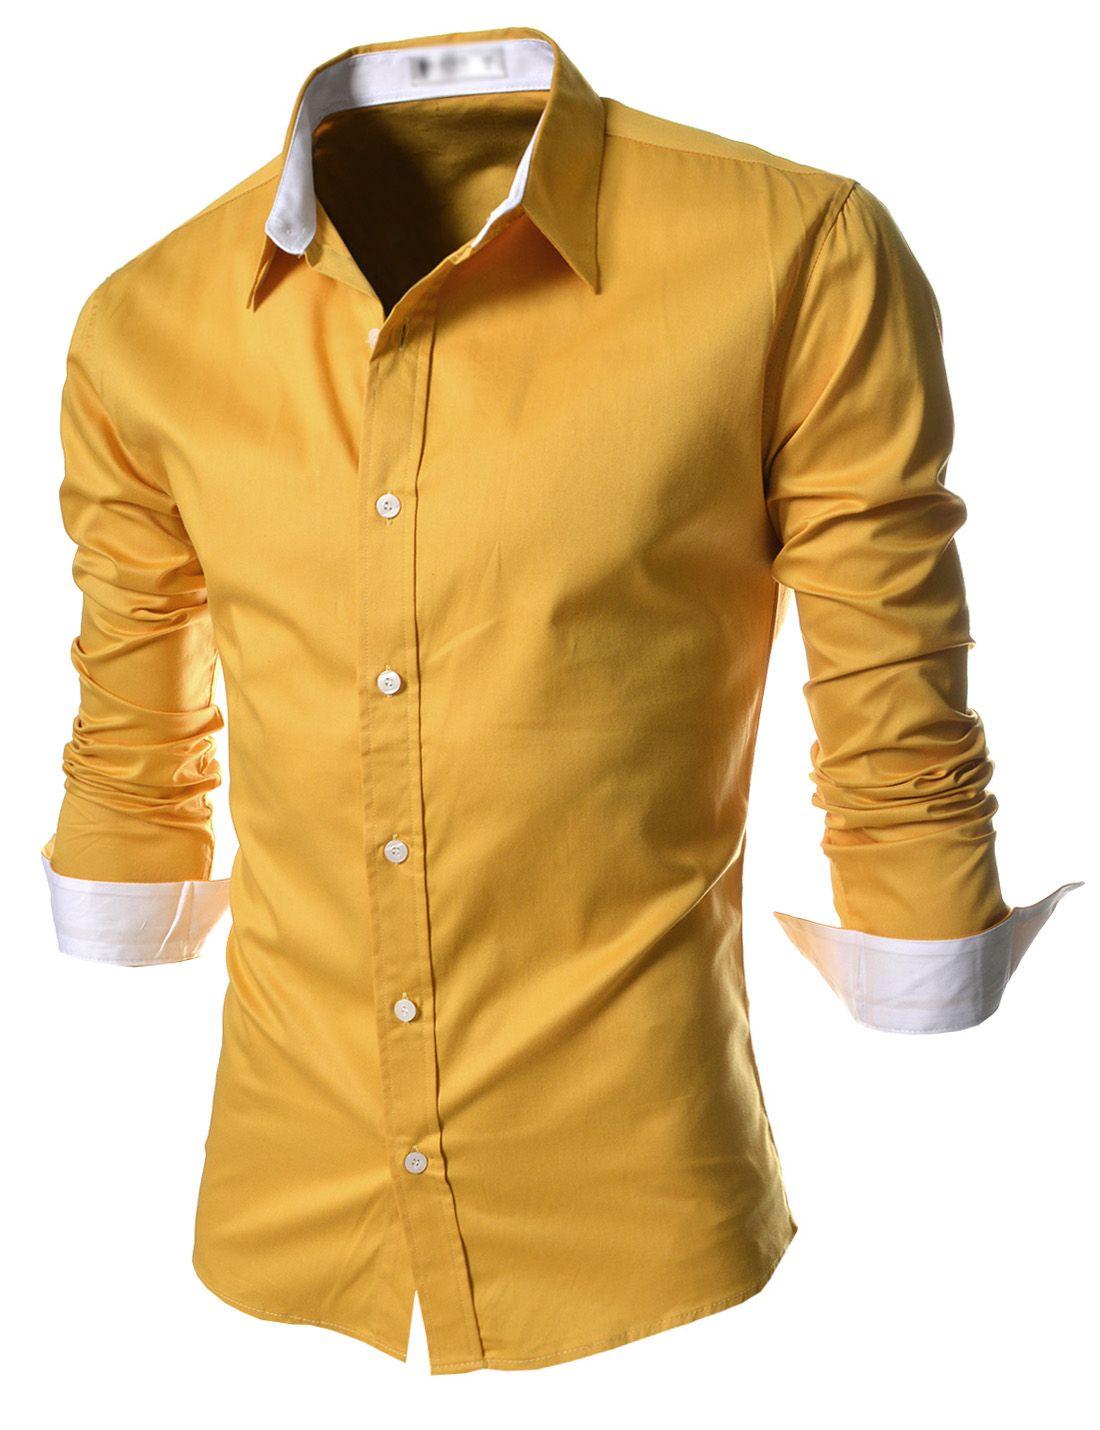 Yellow flannel outfits  Yellow dress shirt Slim fit  Memes  Pinterest  Yellow dress